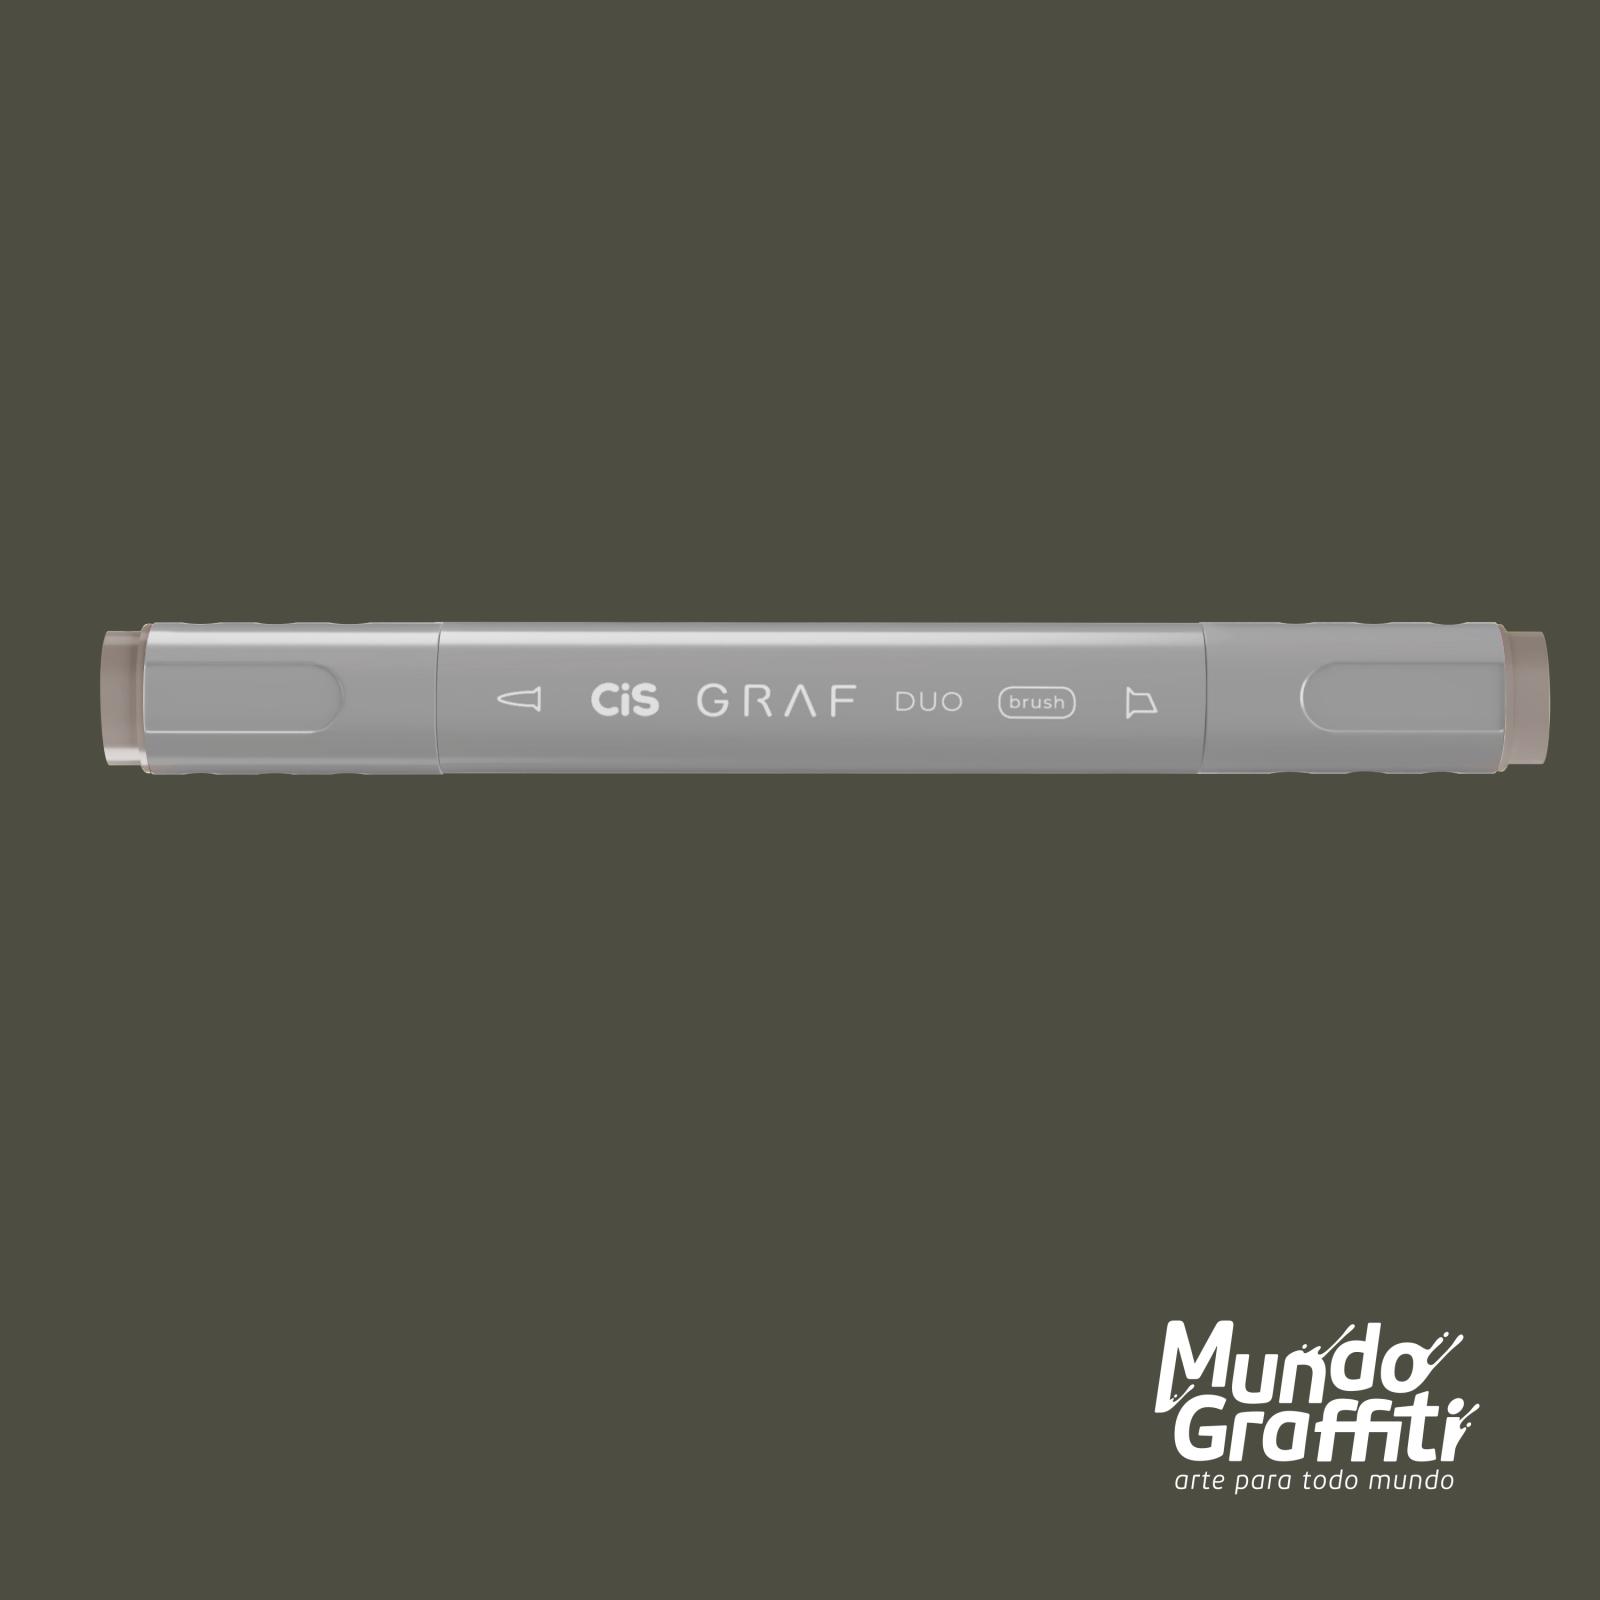 Marcador Cis Graf Duo Brush Warm Grey WG6 - Mundo Graffiti